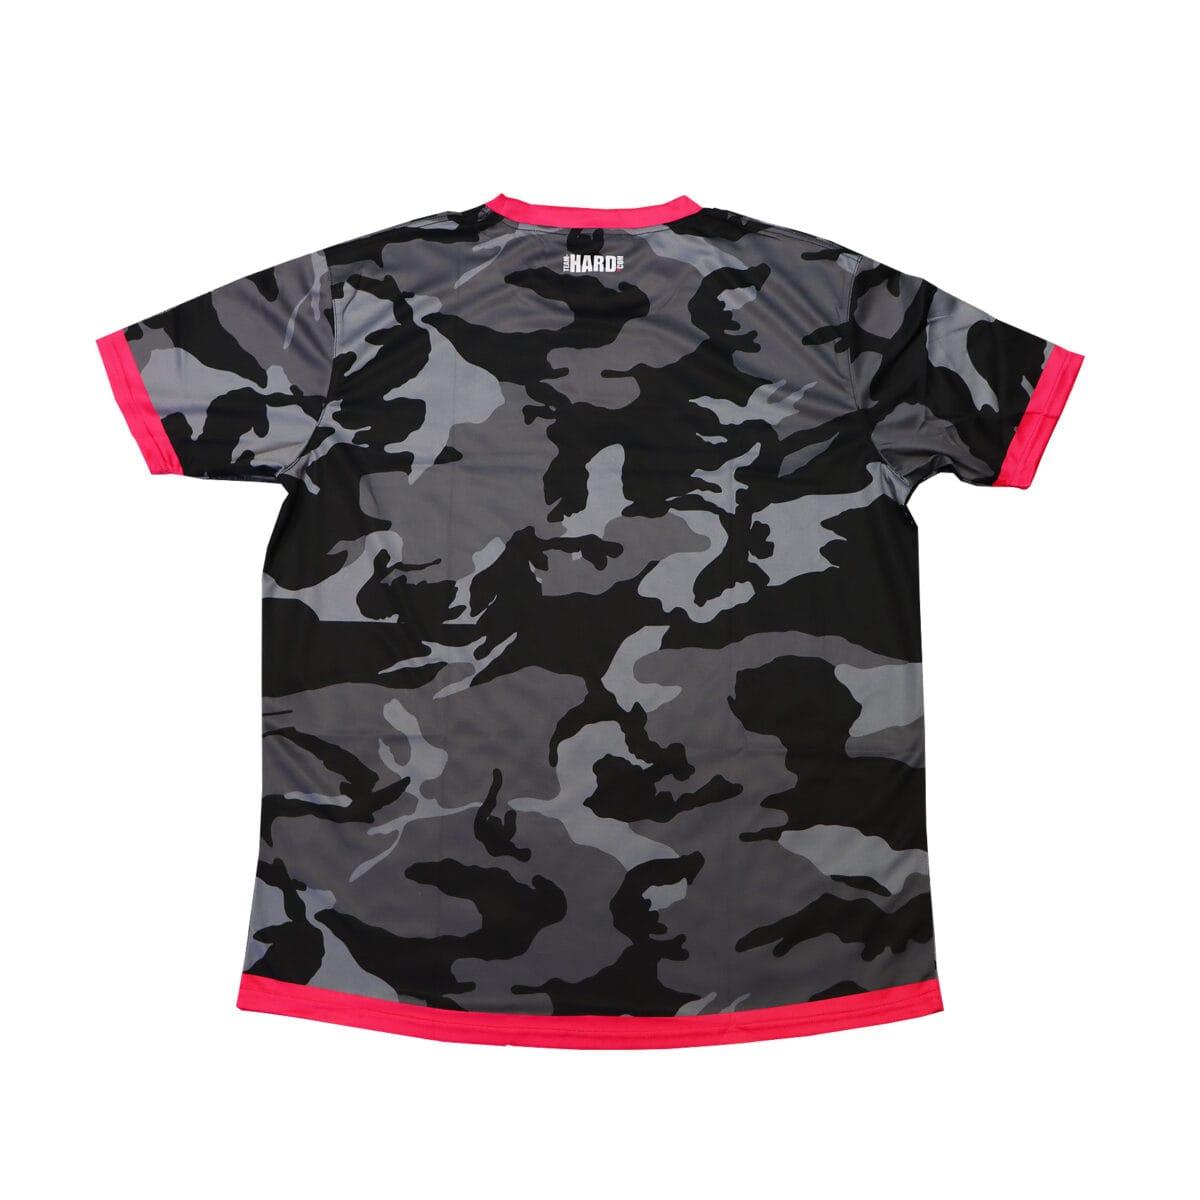 Team hard football t shirt